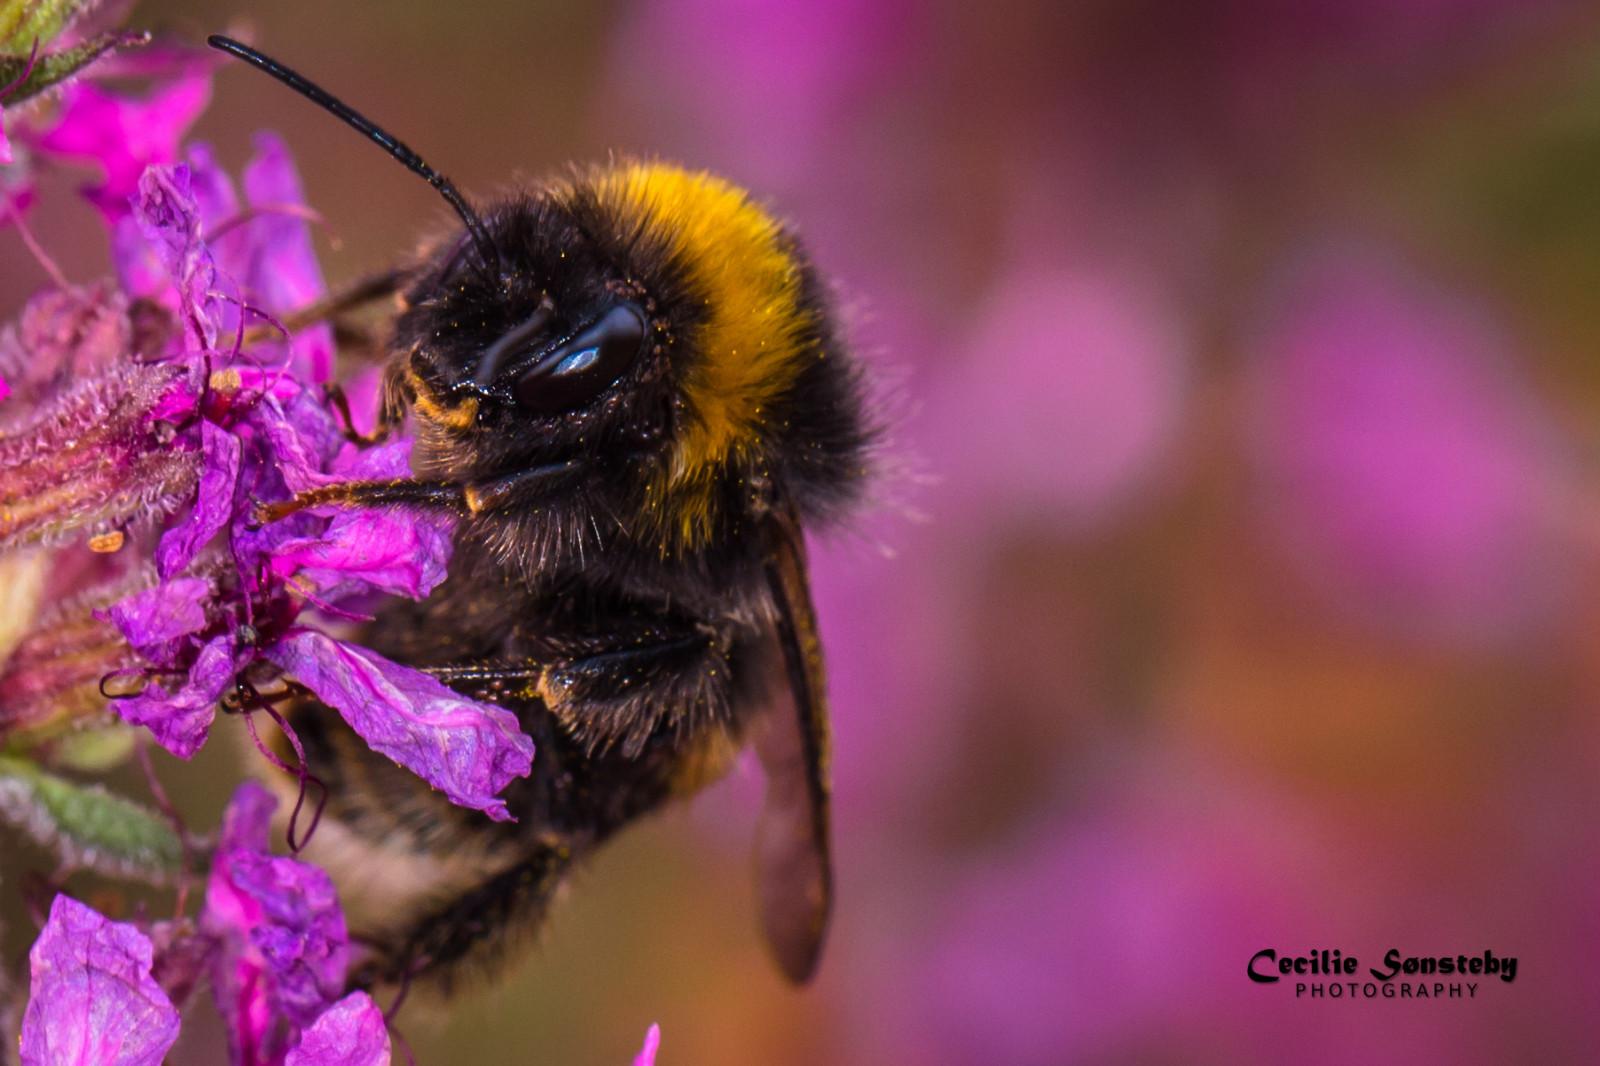 Fondos De Pantalla Retrato Ojos Flores Alas De Cerca Insecto